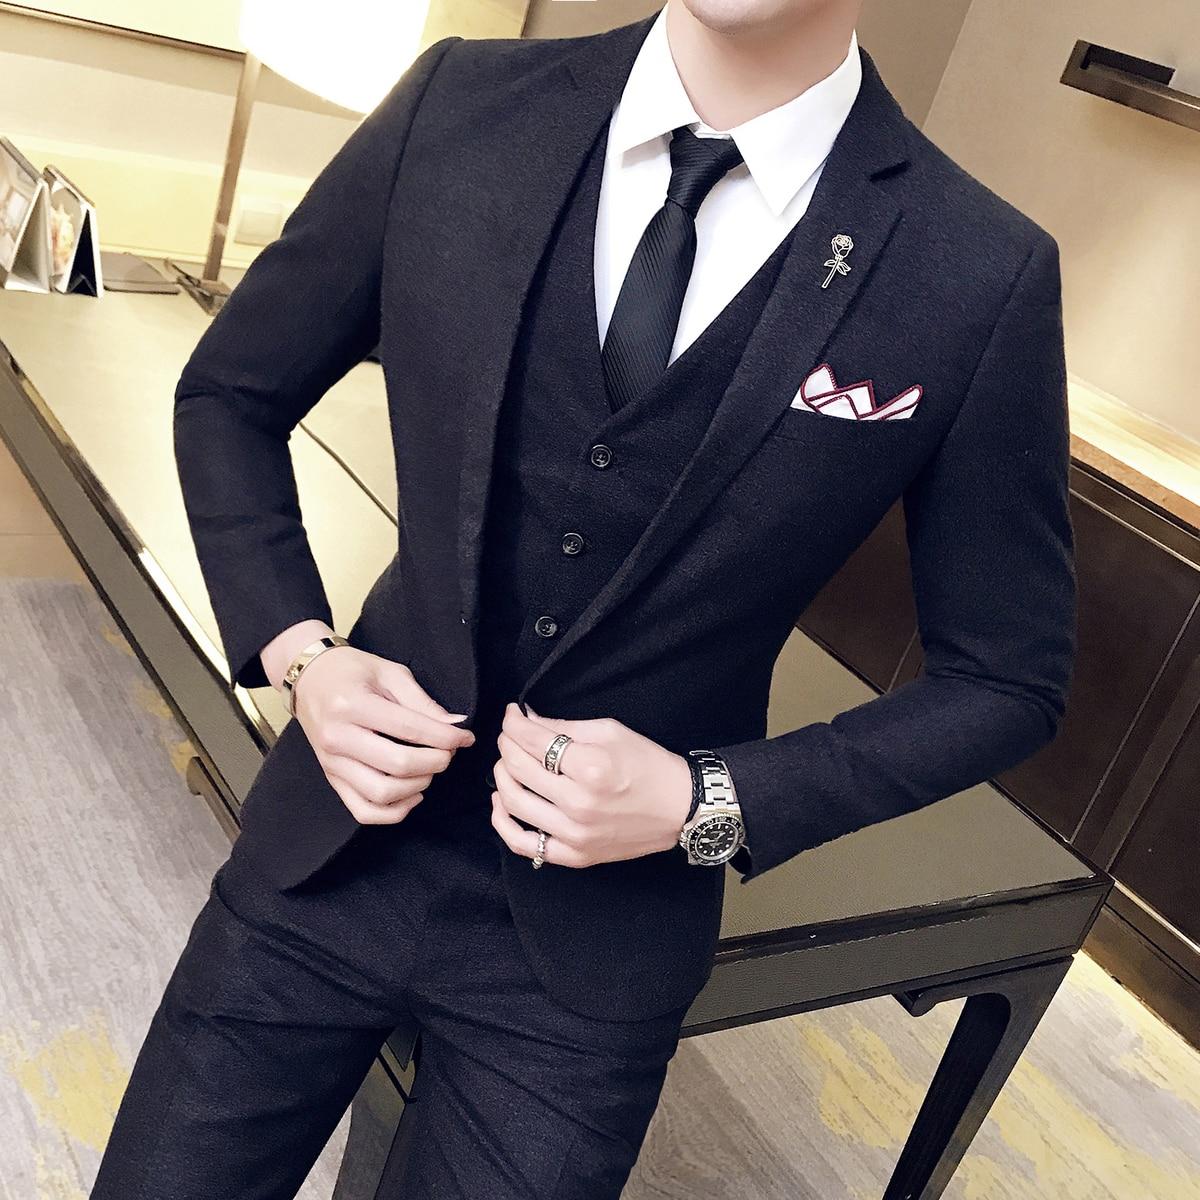 Designers Wool Suits 3 Piece Suit Men  Black Slim Vingtage Suit Wedding Dress Business Acostume Homme Vestito Uomo Smoking